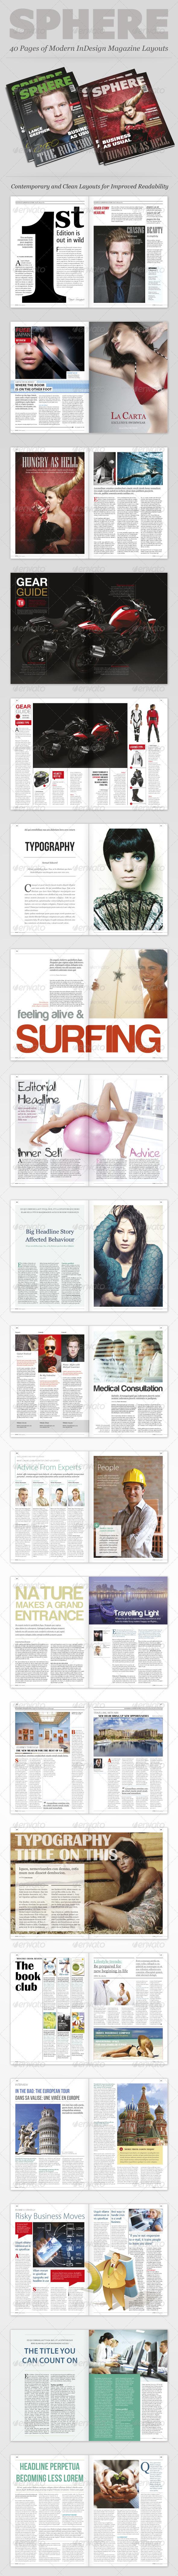 GraphicRiver InDesign Magazine Sphere 2180863